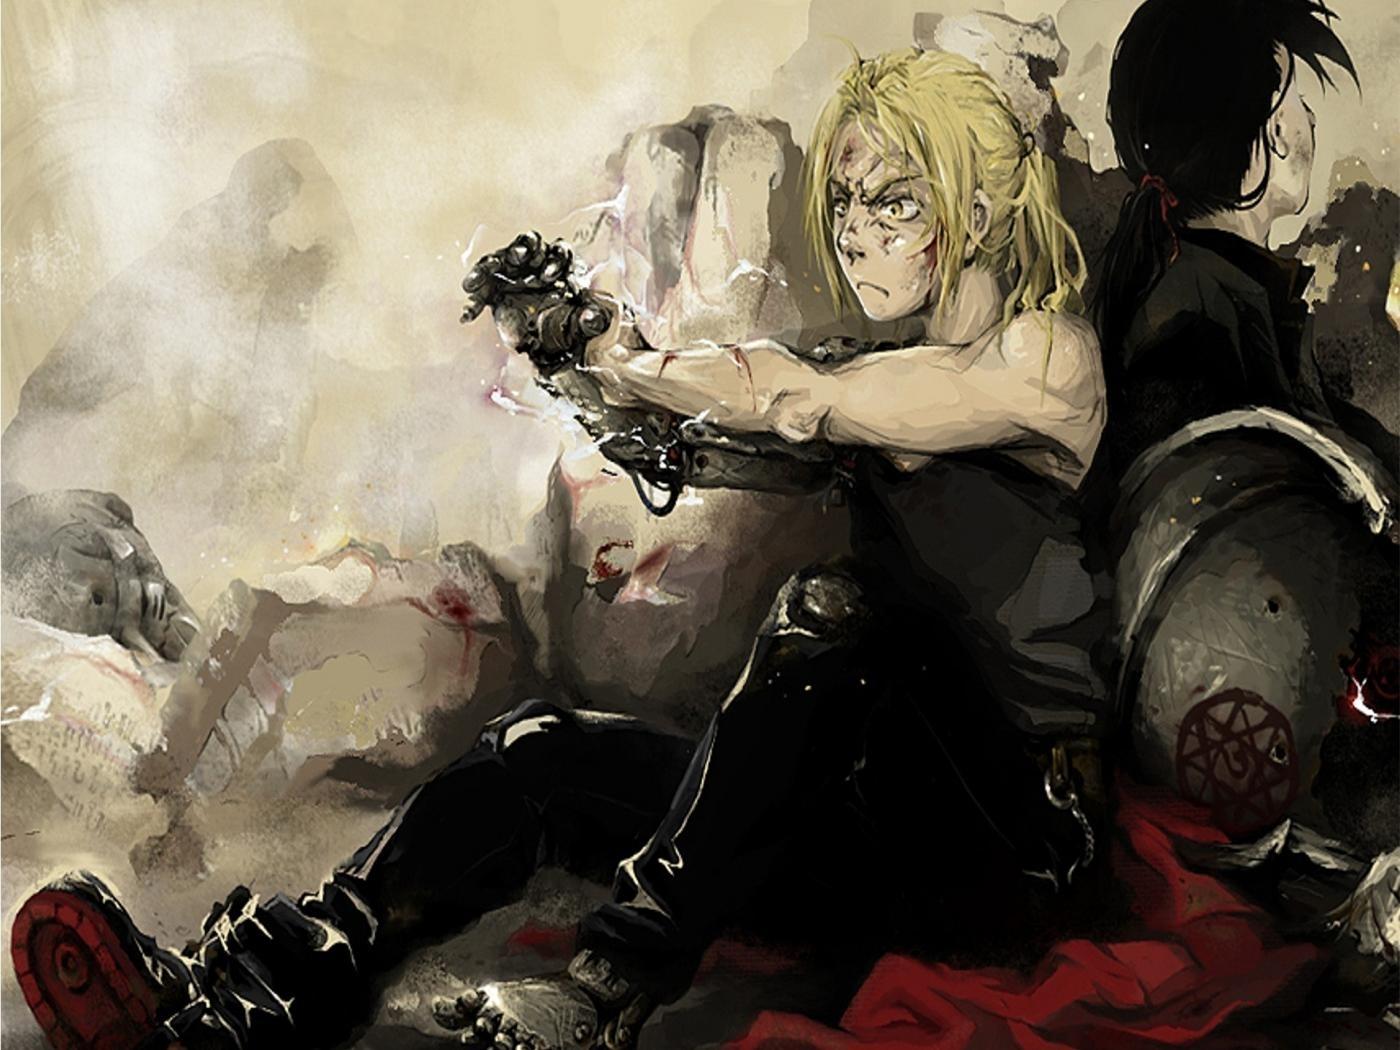 edward elric in hd wallpaper | anime - full metal alchemist